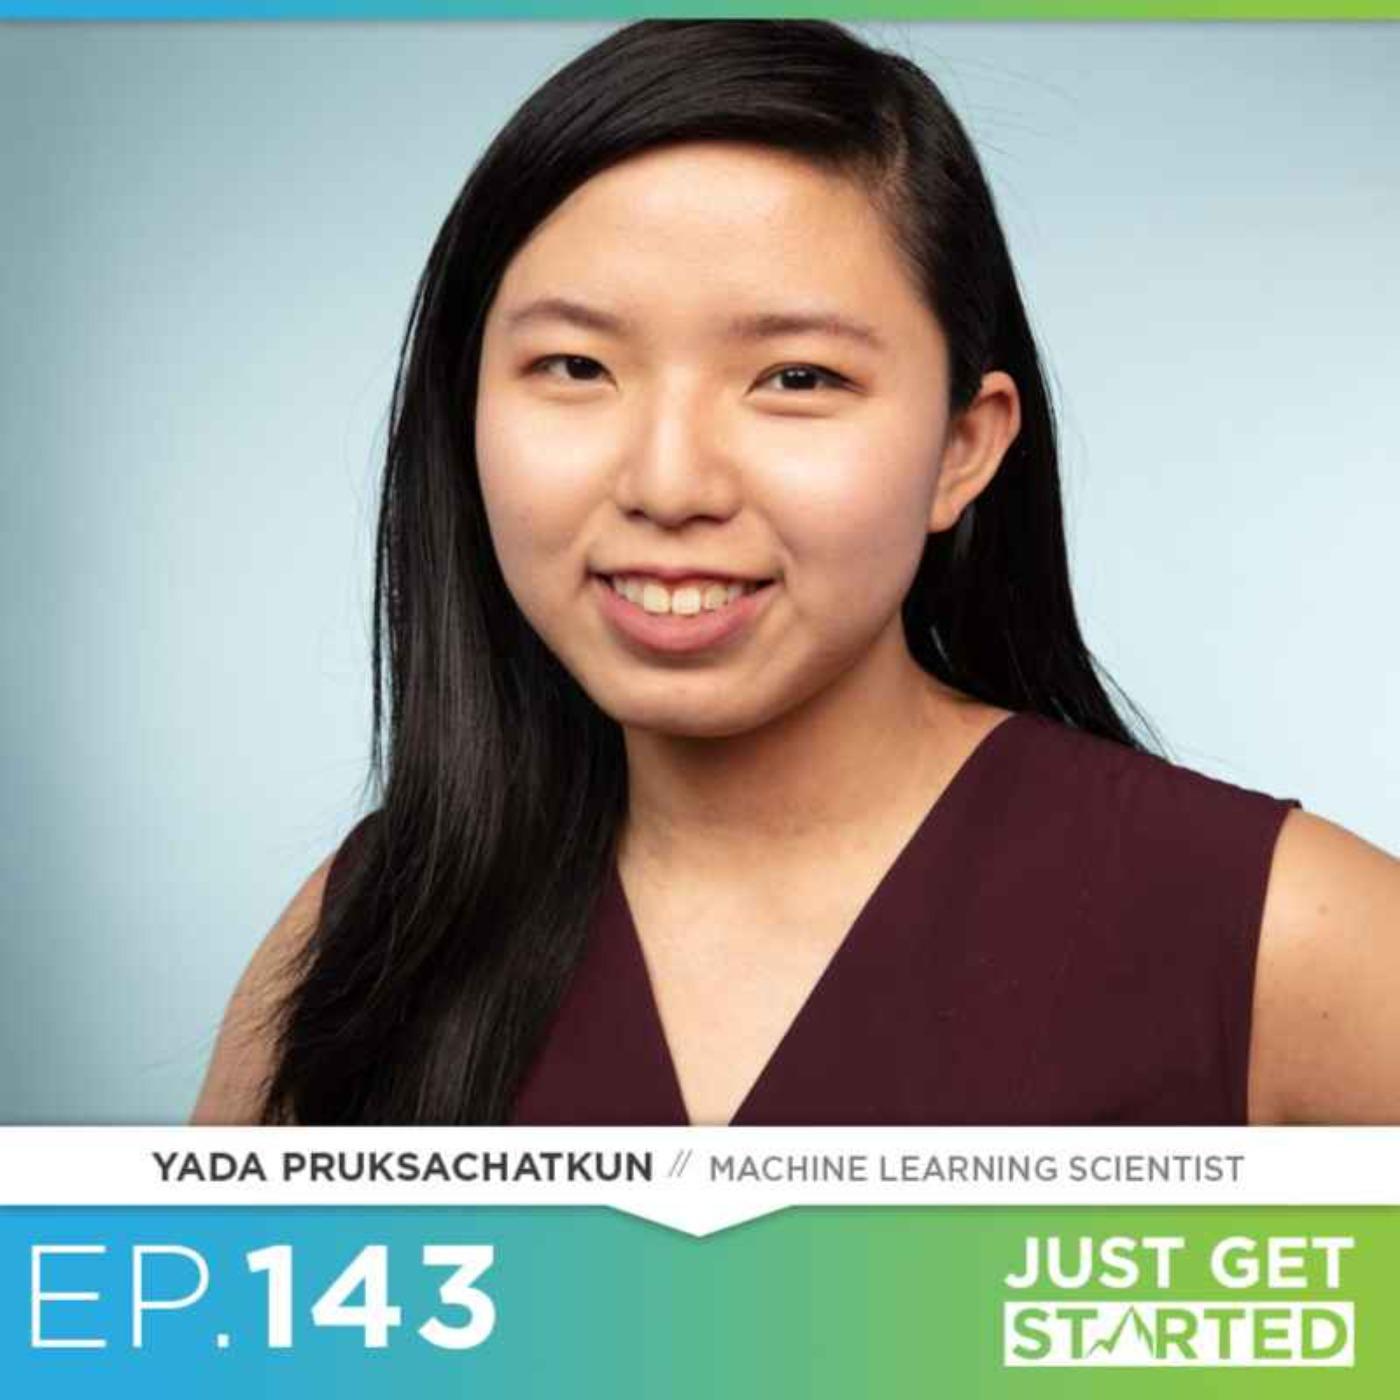 #143 Yada Pruksachatkun on Women In Tech, Side Hustles and Bullying